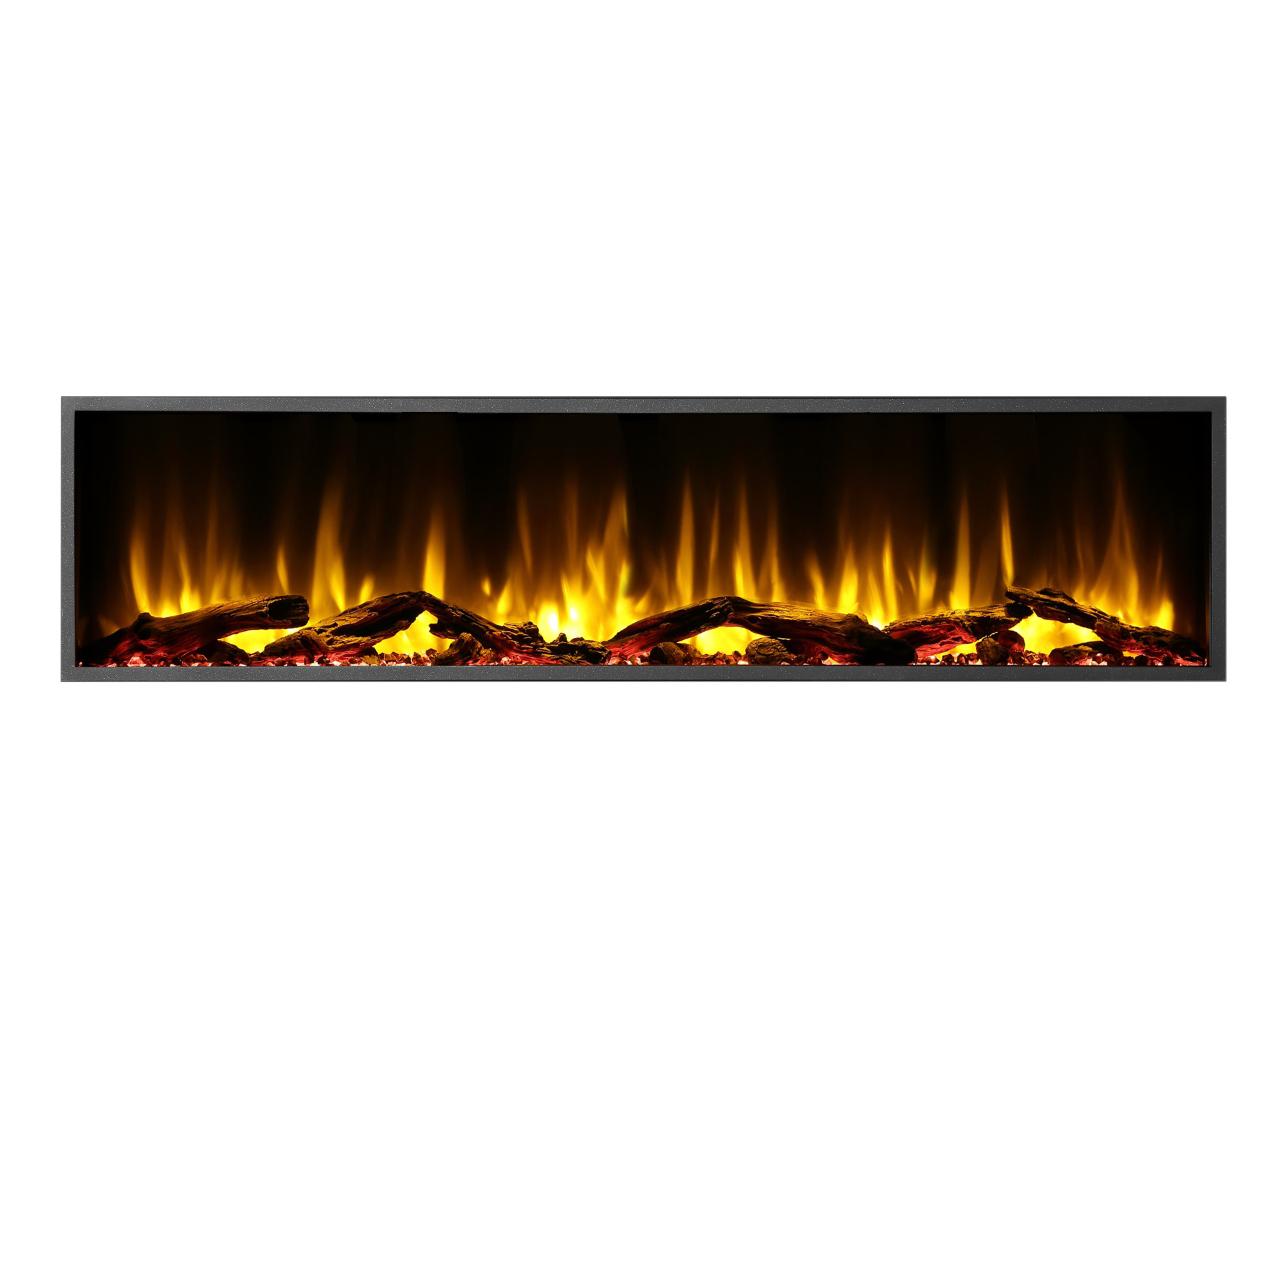 "Dynasty Harmony BEF Series 64"" Linear Electric Fireplace"